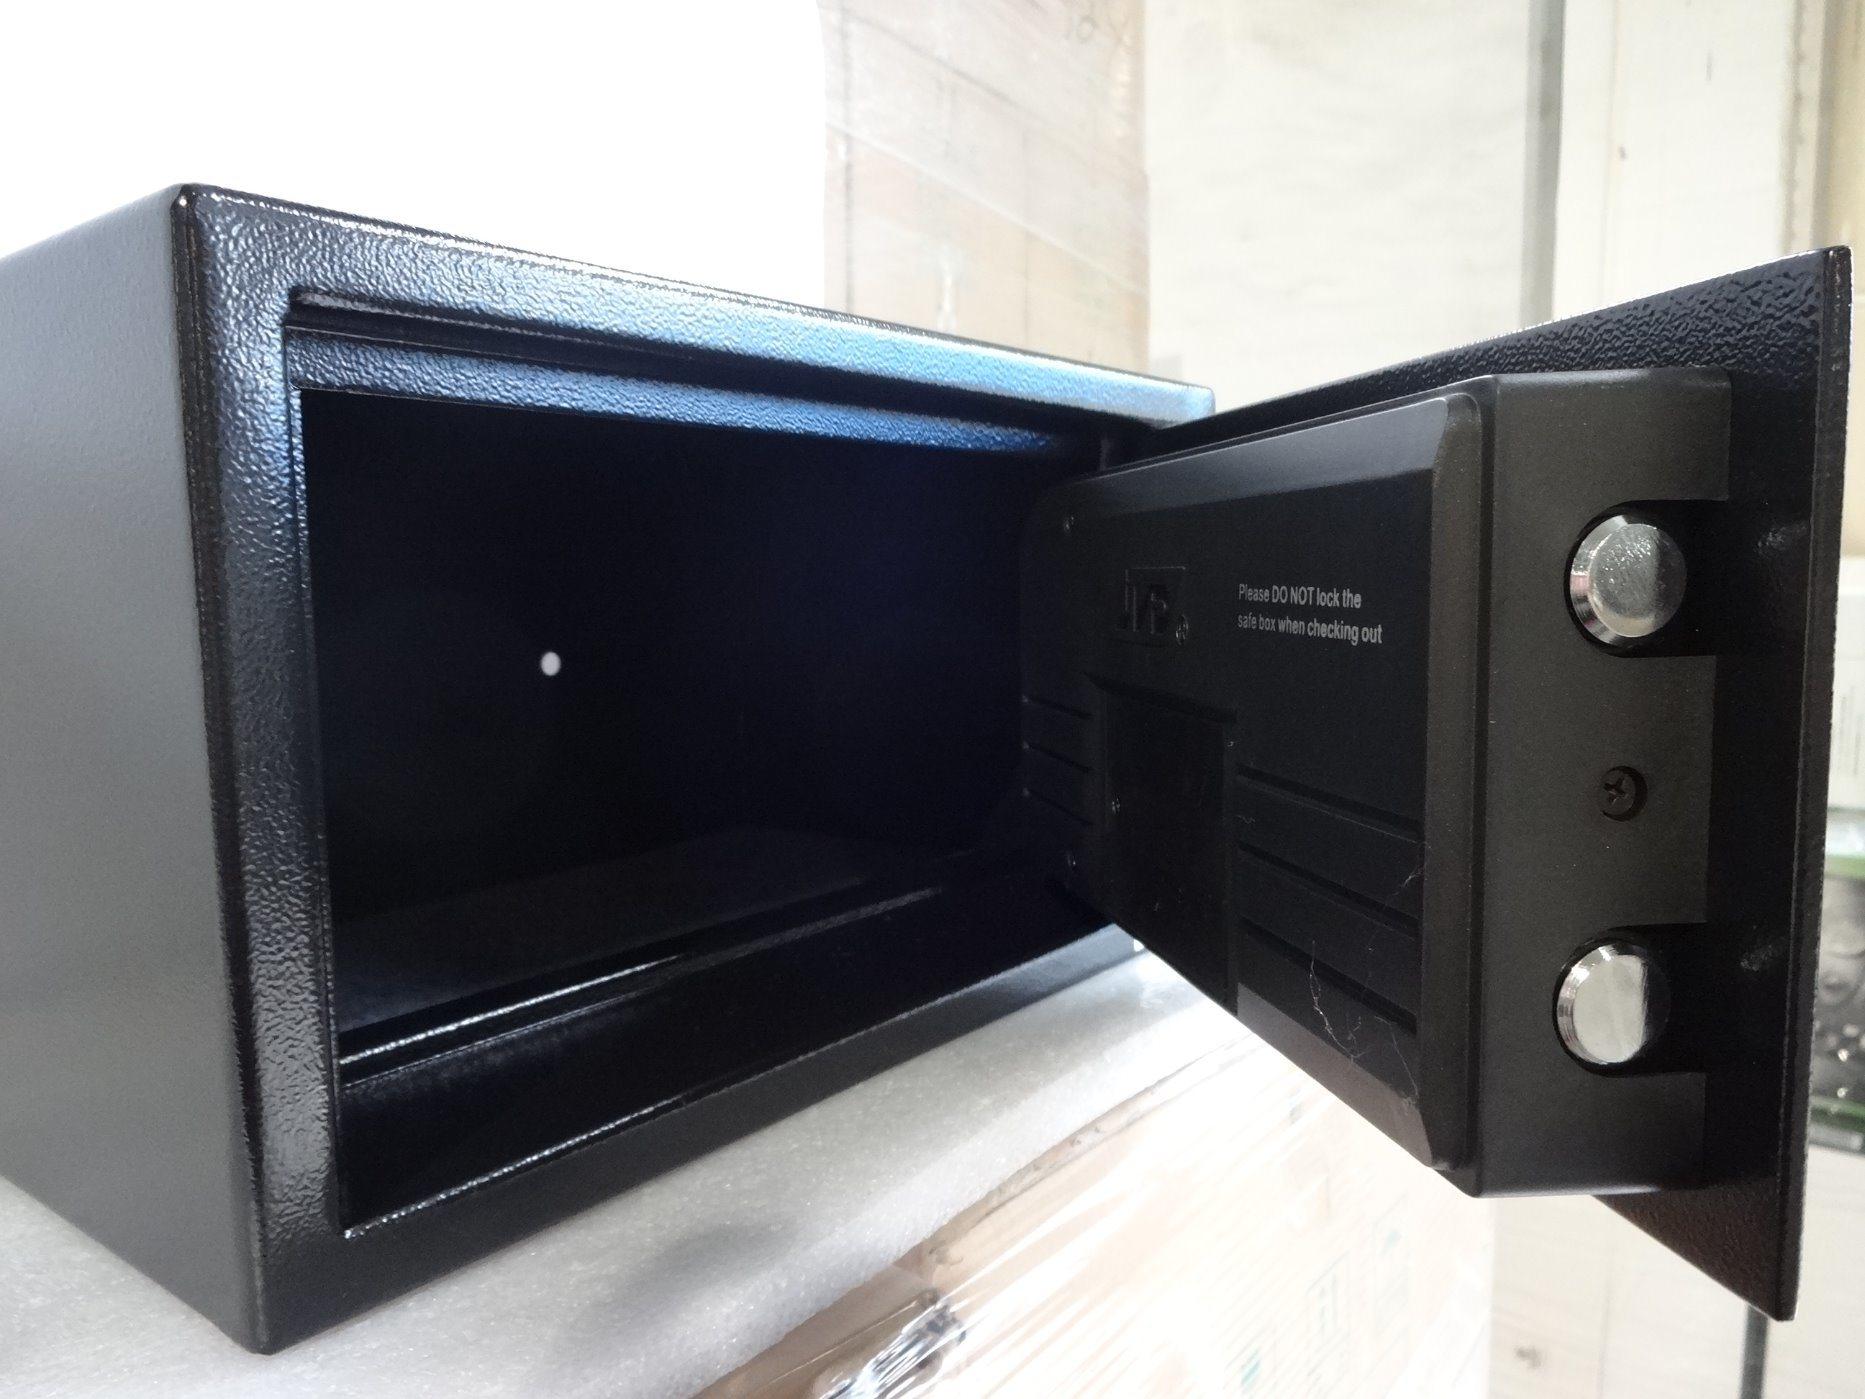 Hotel Safe Box with Digital Lock-Yk230-Bk/Wh